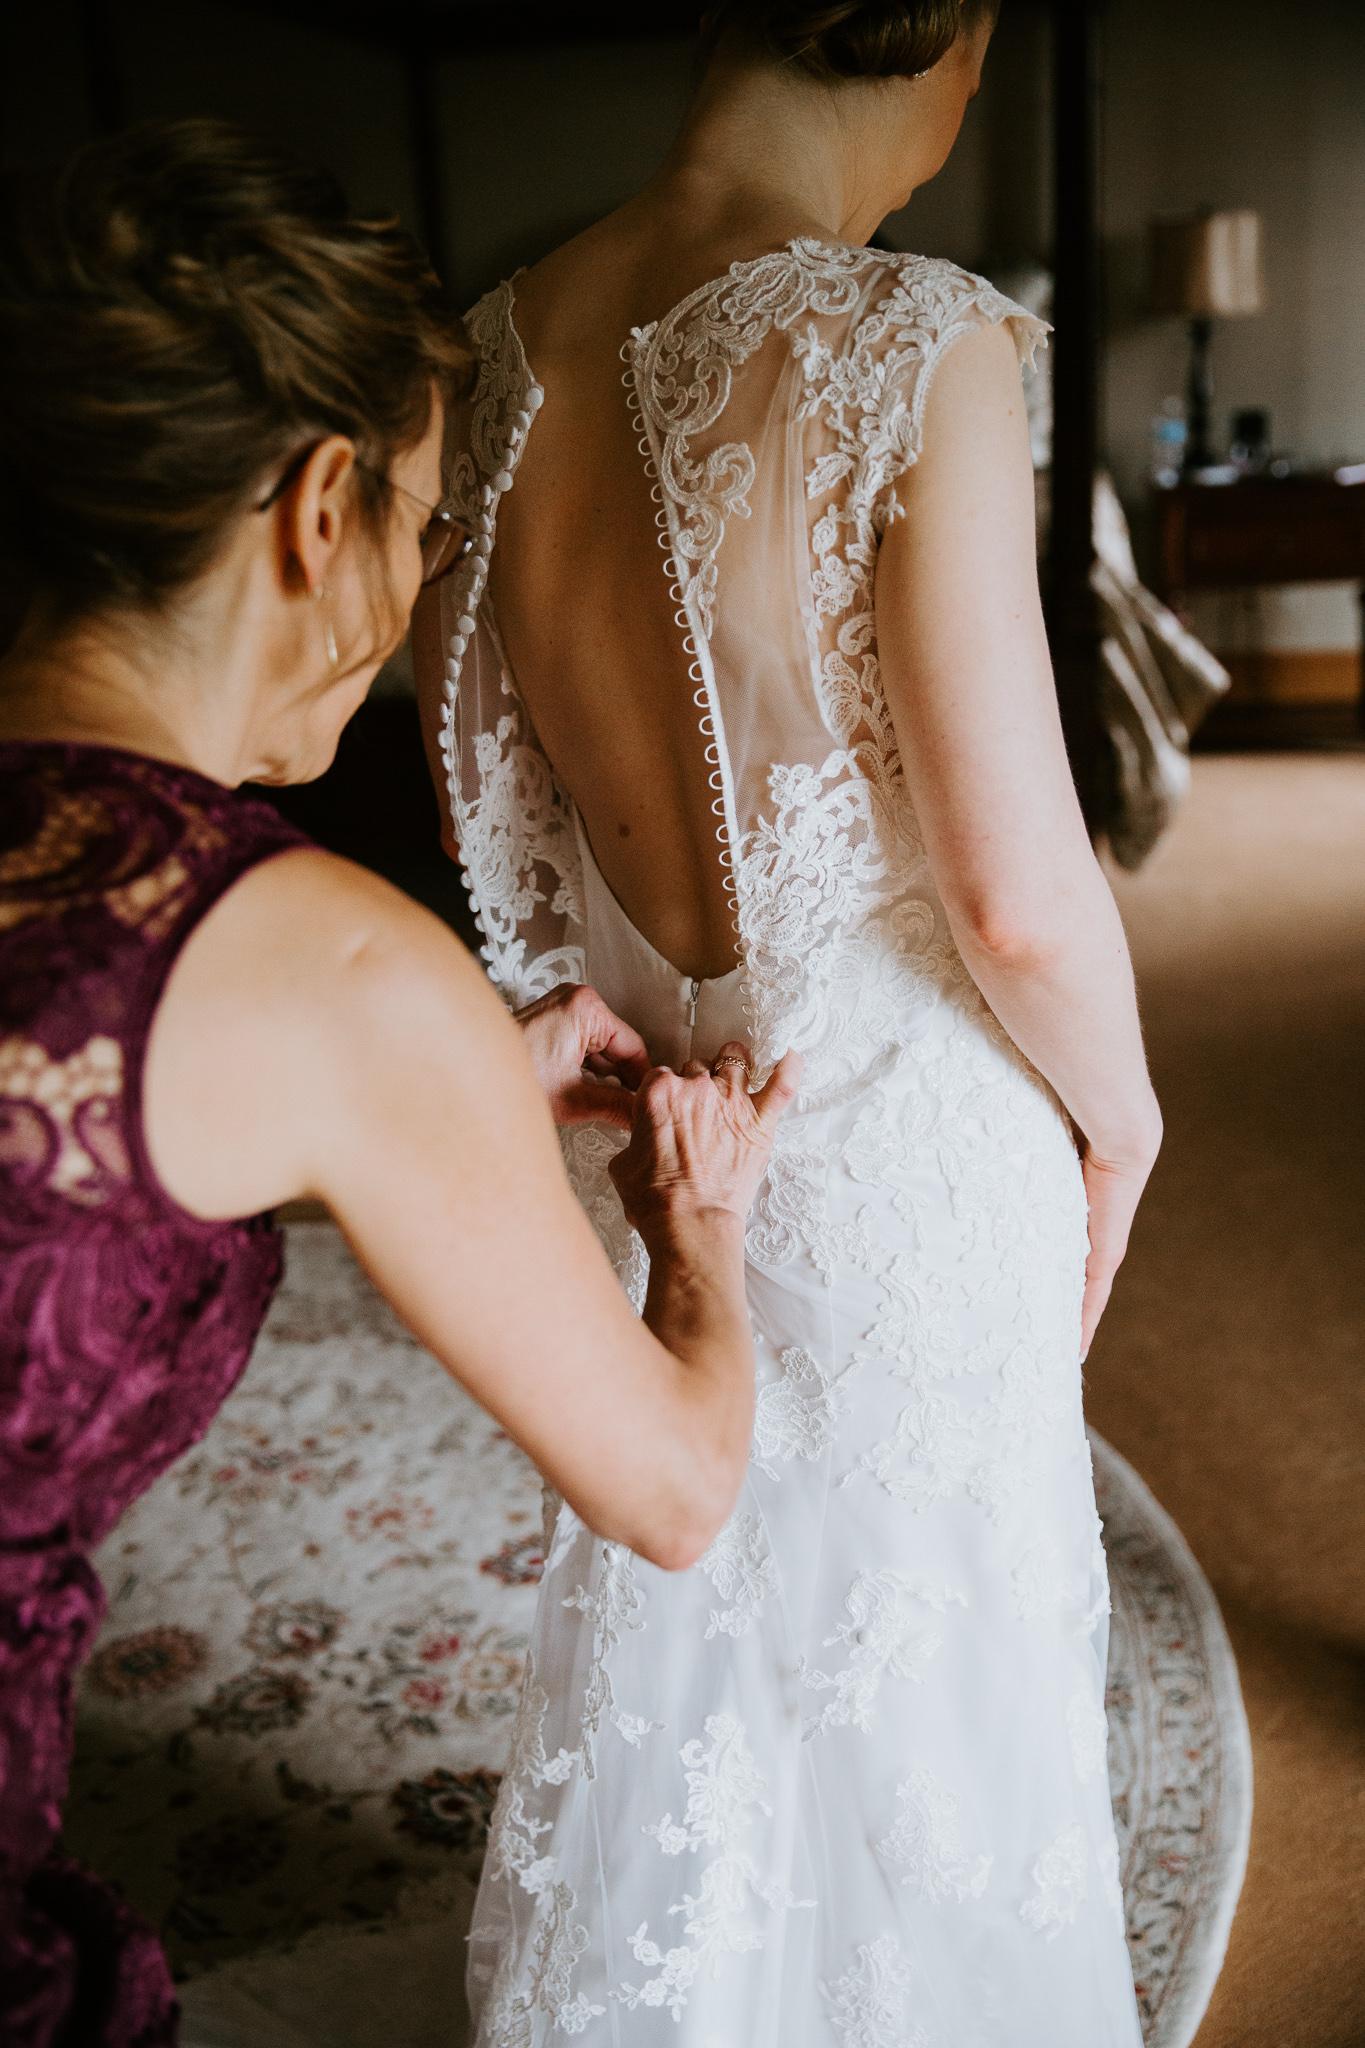 House Mountain Inn - Weddings - Lexington - Virginia - Best Wedding Photographer - Pat Cori Photography-15.jpg